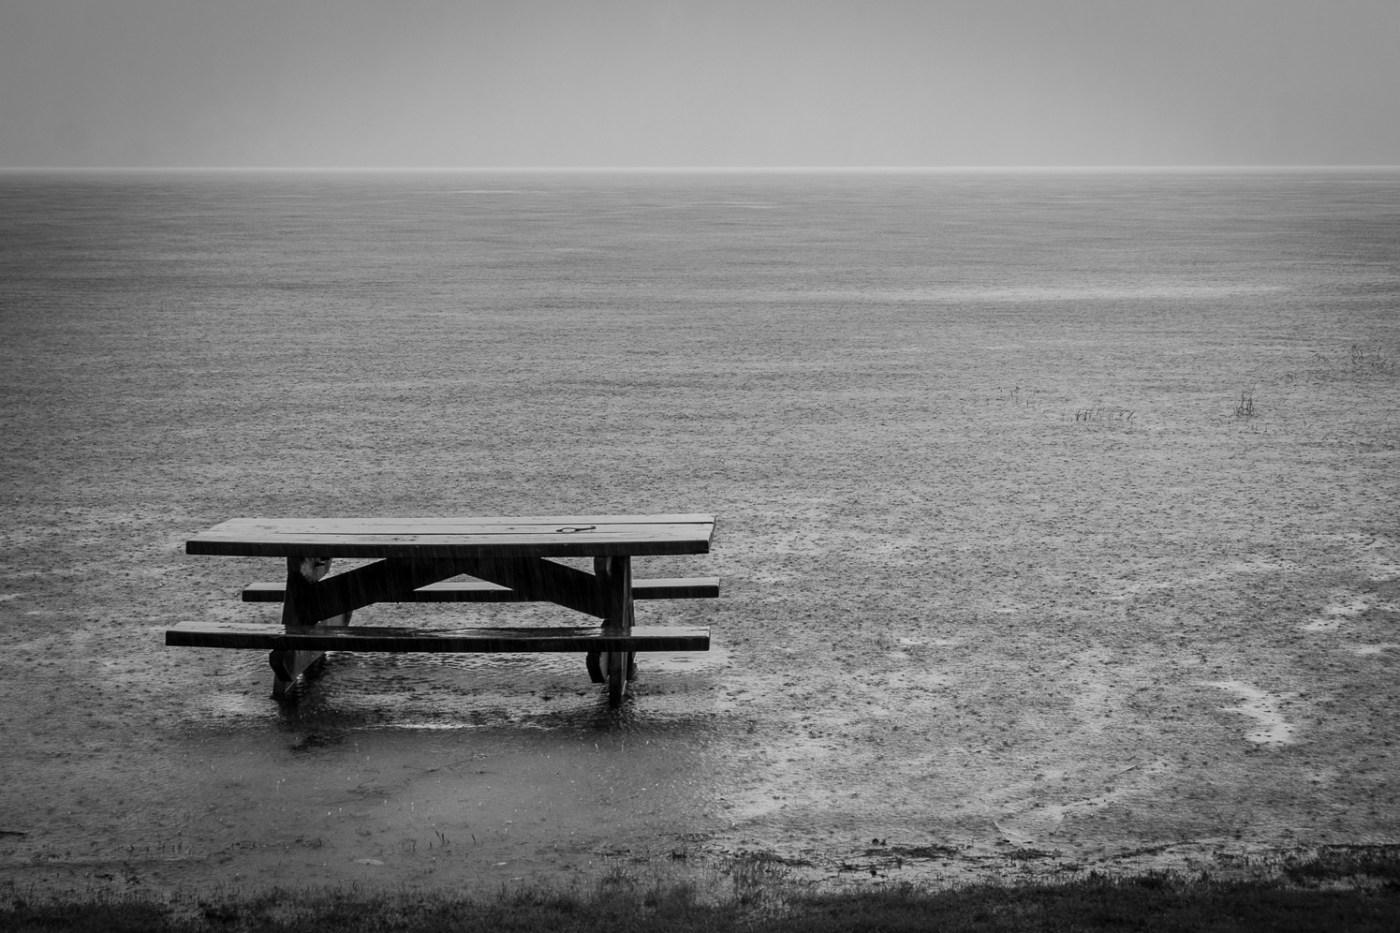 Rainy picnic by the lake